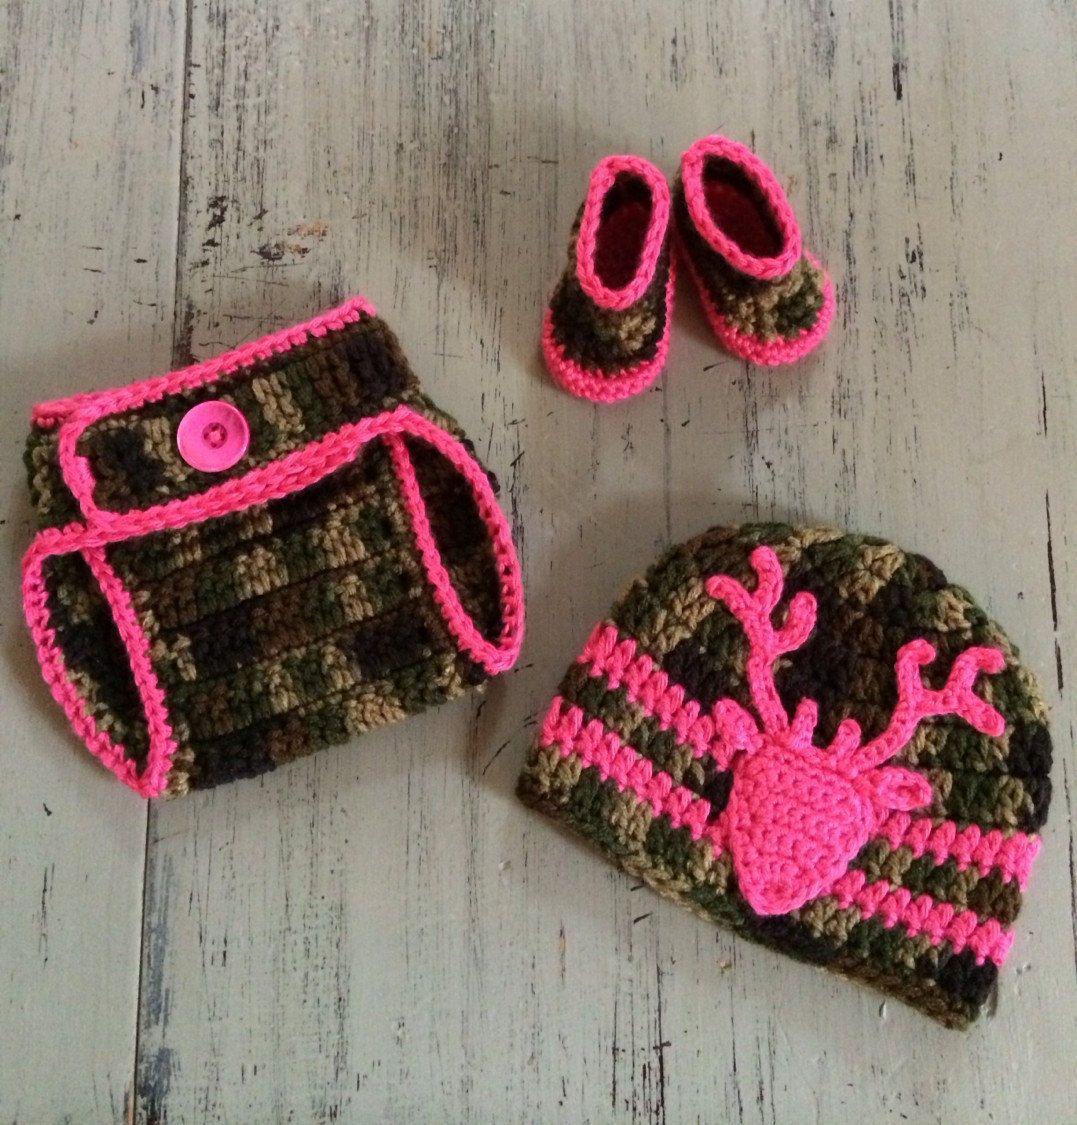 Newborn Baby Girl Crochet Camo hat, diaper cover and booties ...